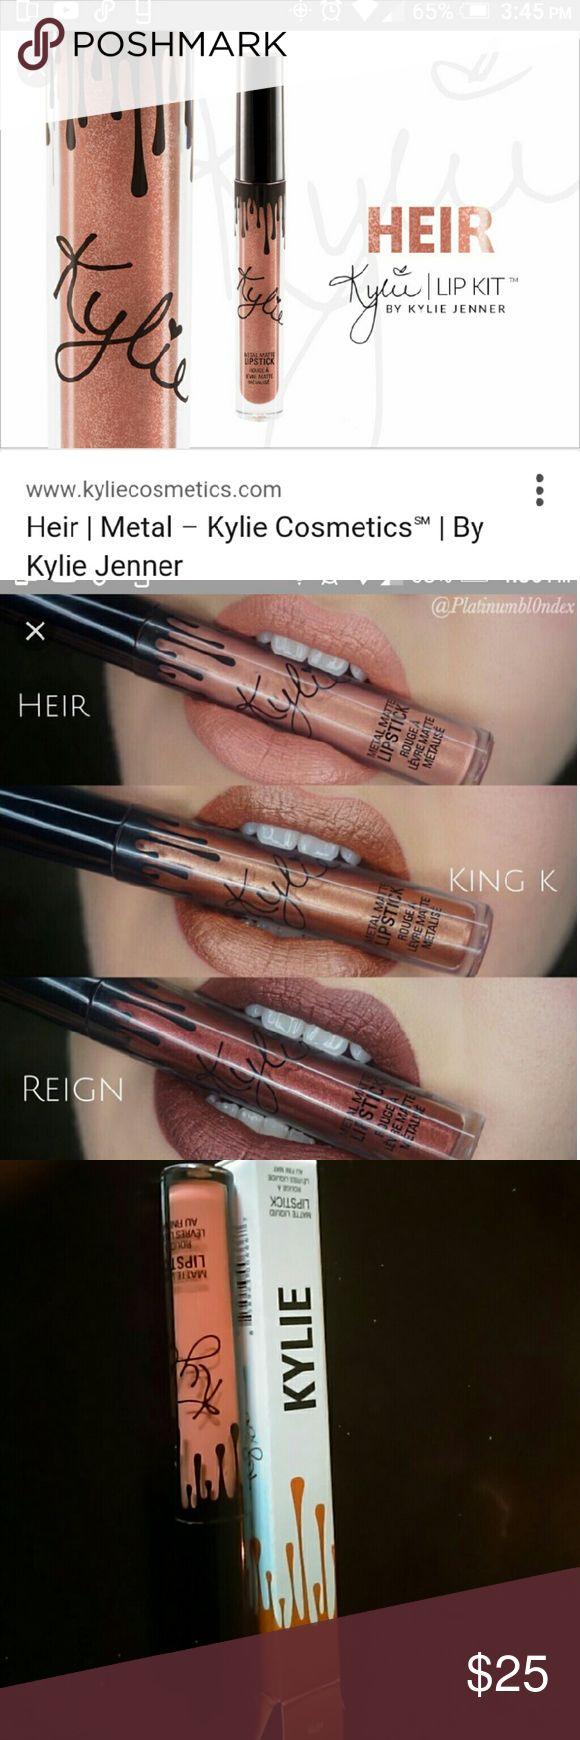 17 Best Ideas About Kylie Jenner Lipstick On Pinterest